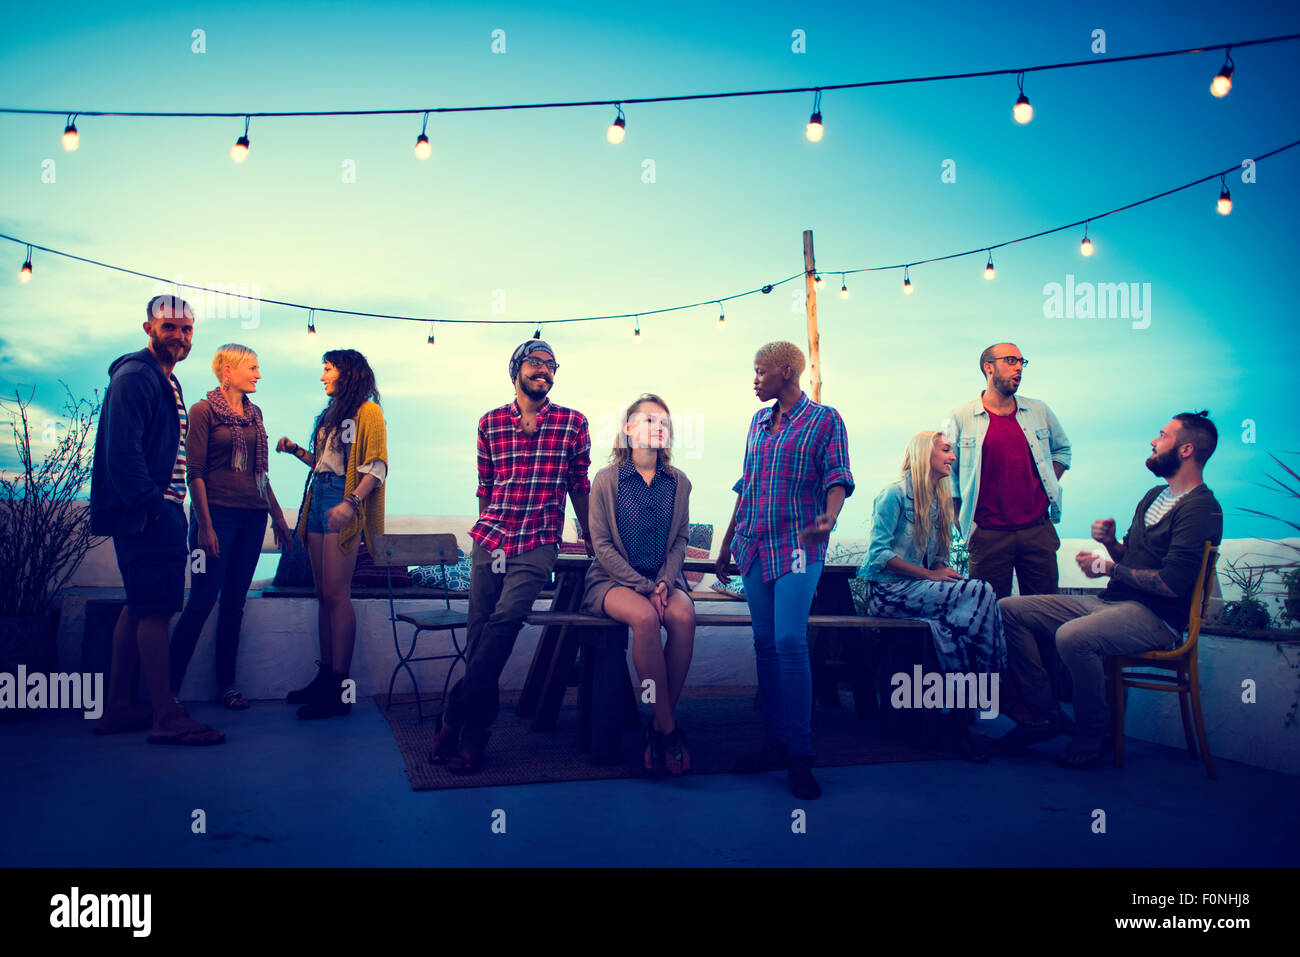 Diversity Sundown Beach Chatting Roof Top Fun Concept - Stock Image